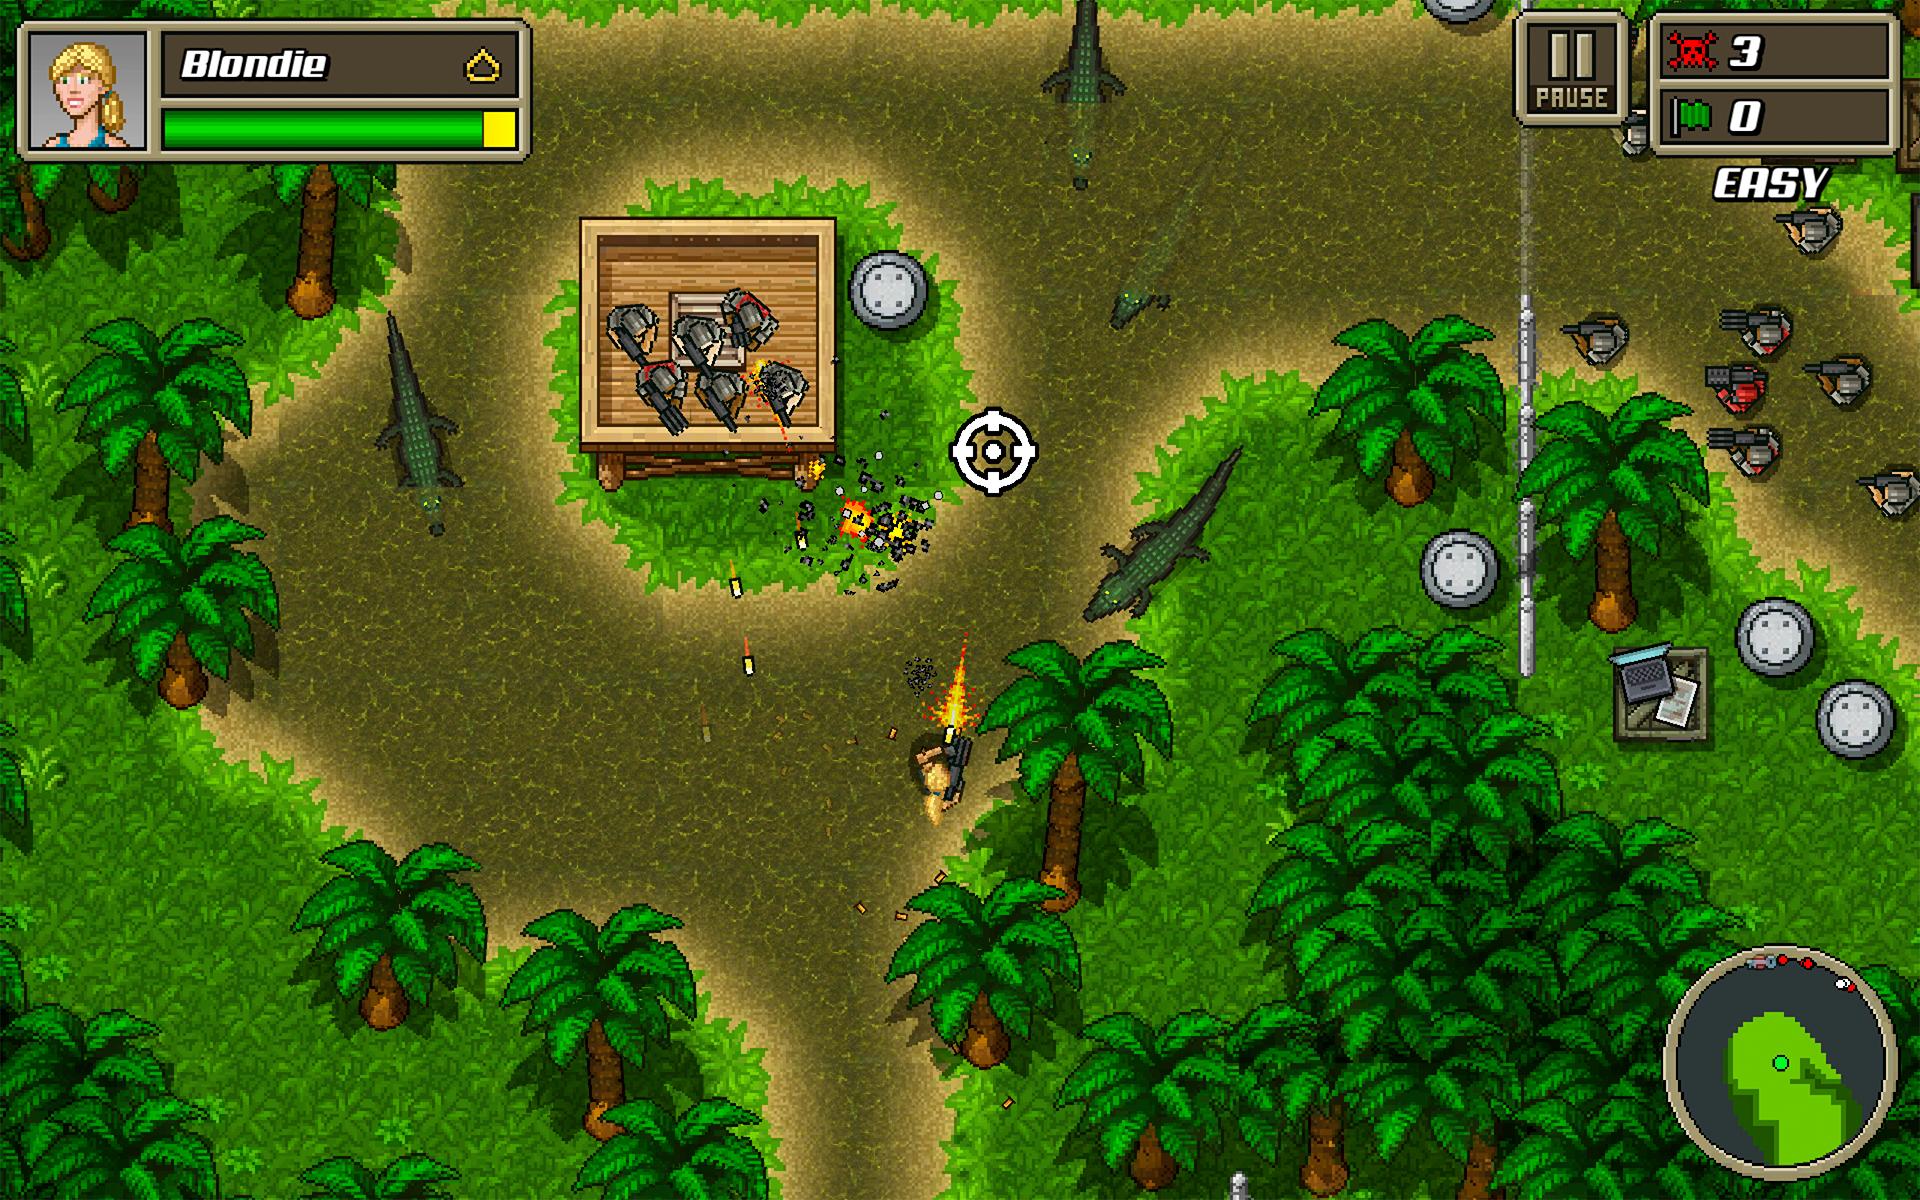 Kick Ass Commandos jungle scene with vicious crocs!